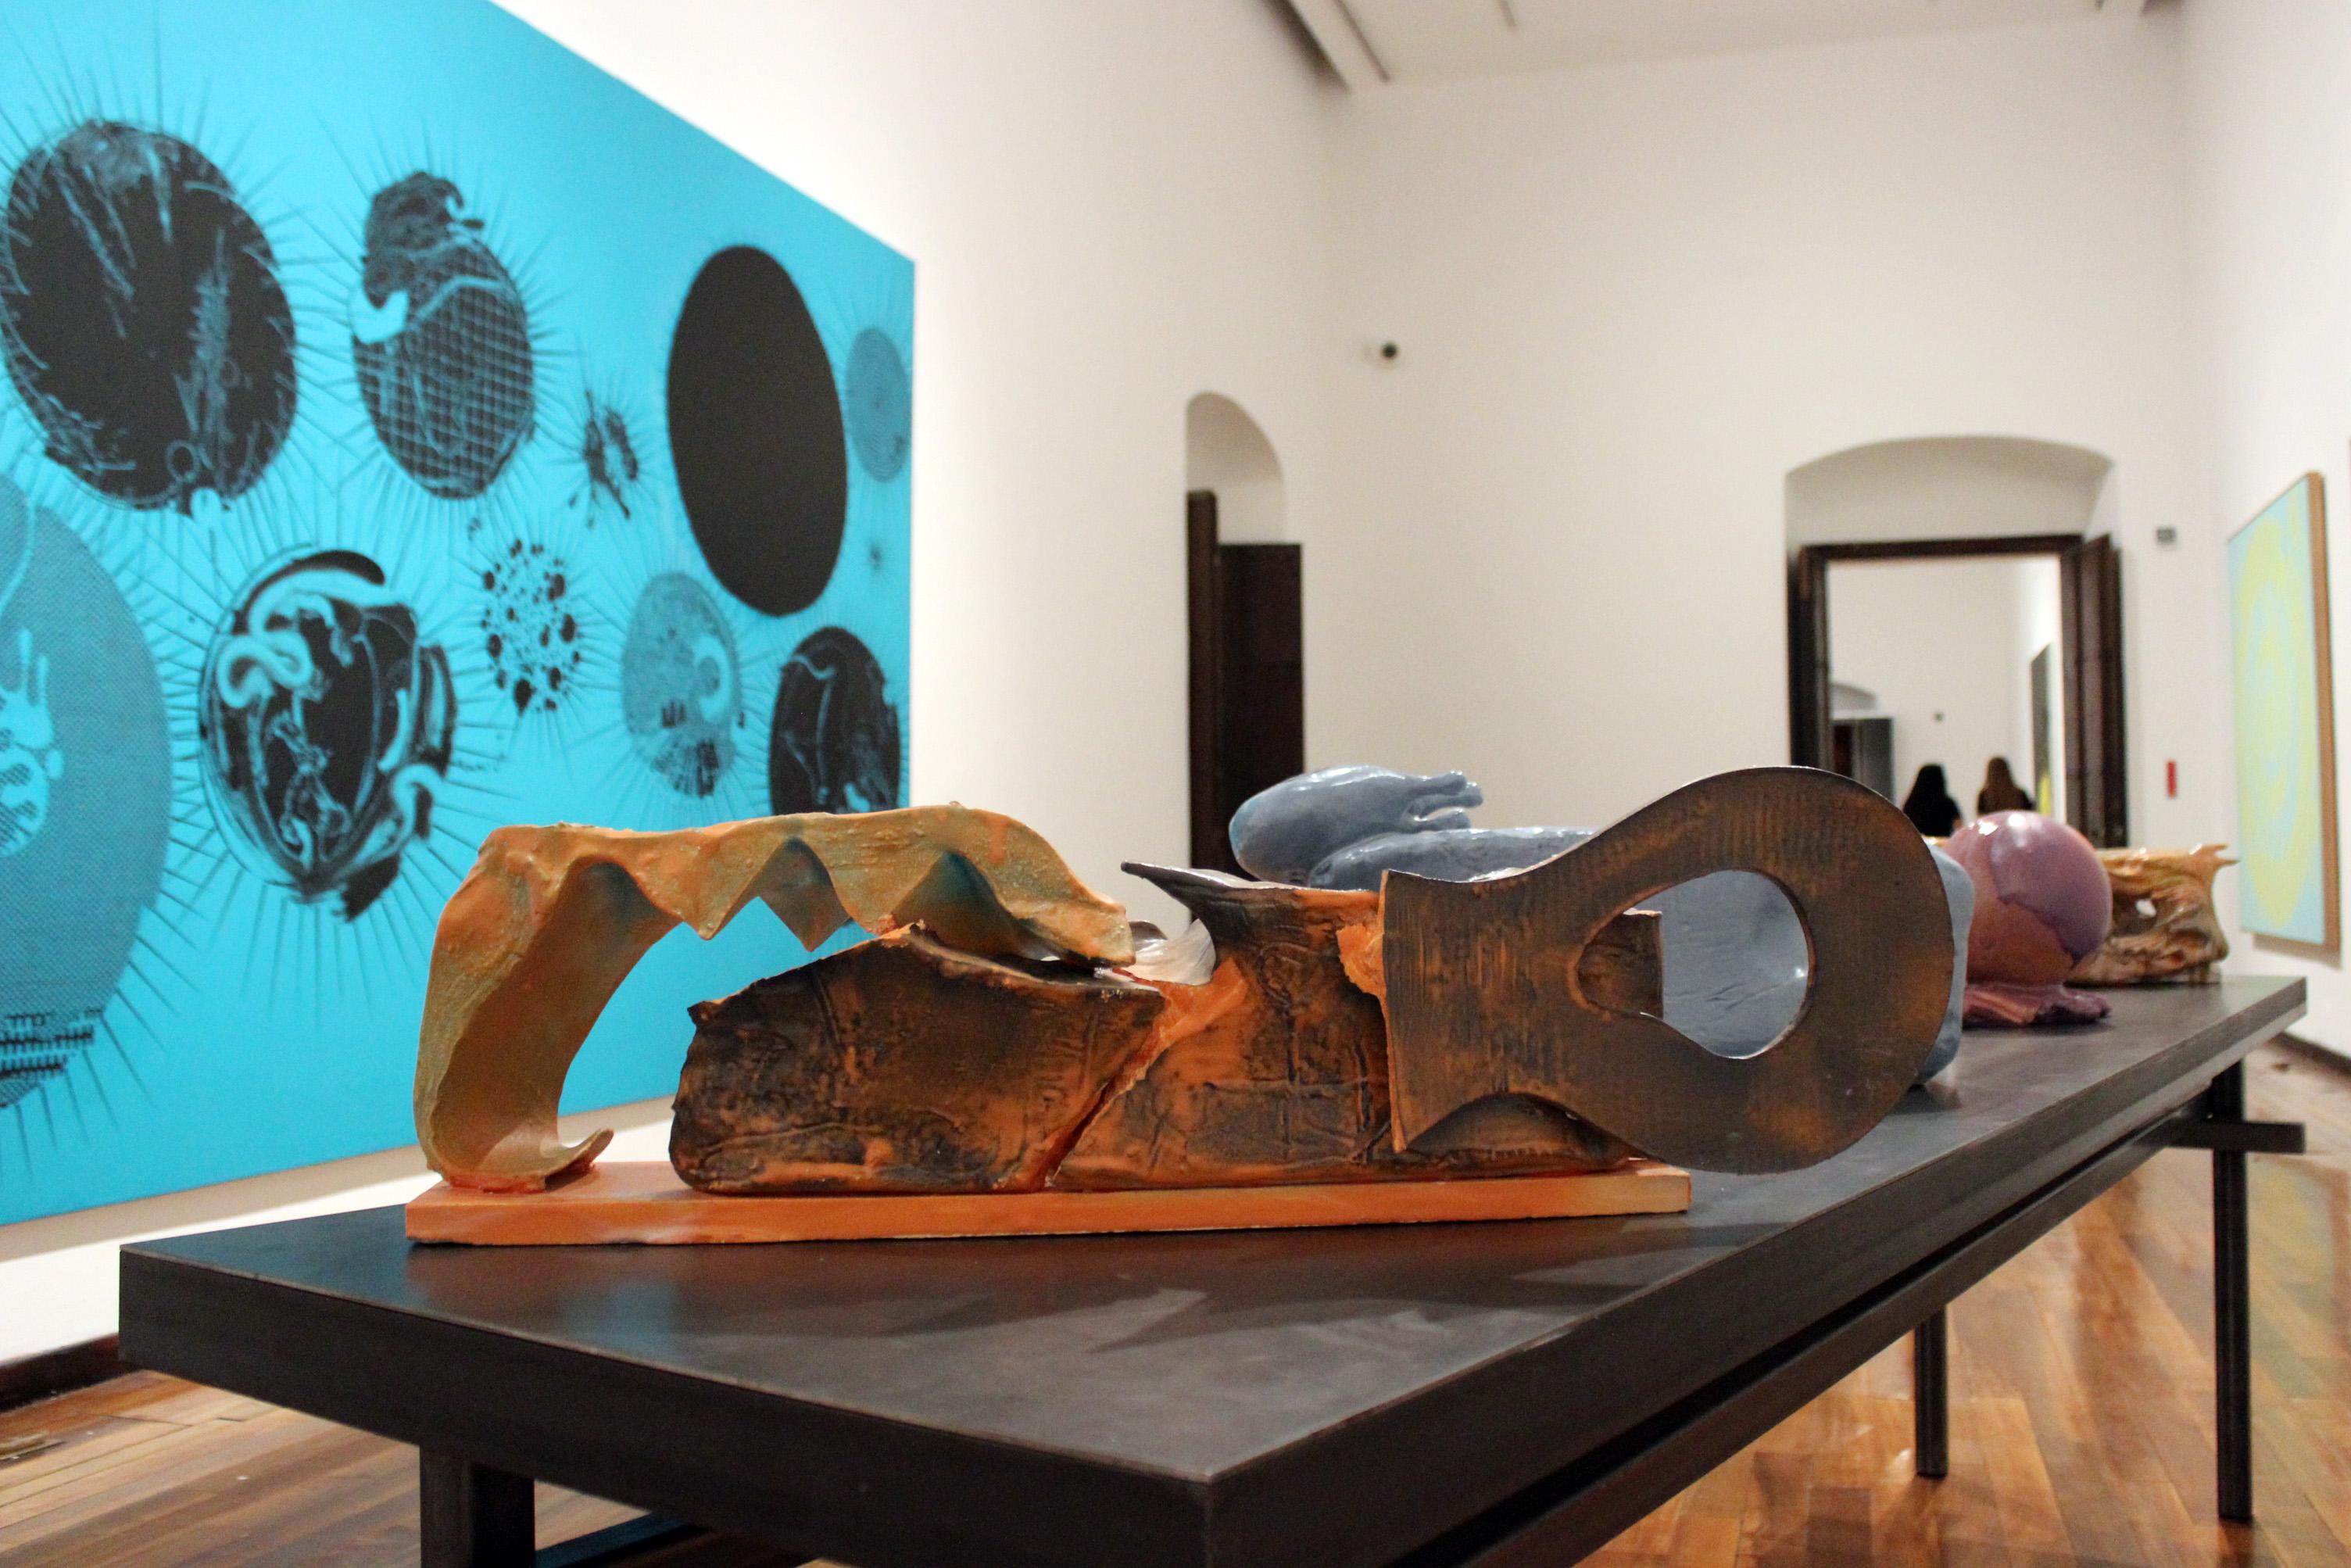 Exposición Nils Erik Gjerdevik / Instituto Cultural Cabañas